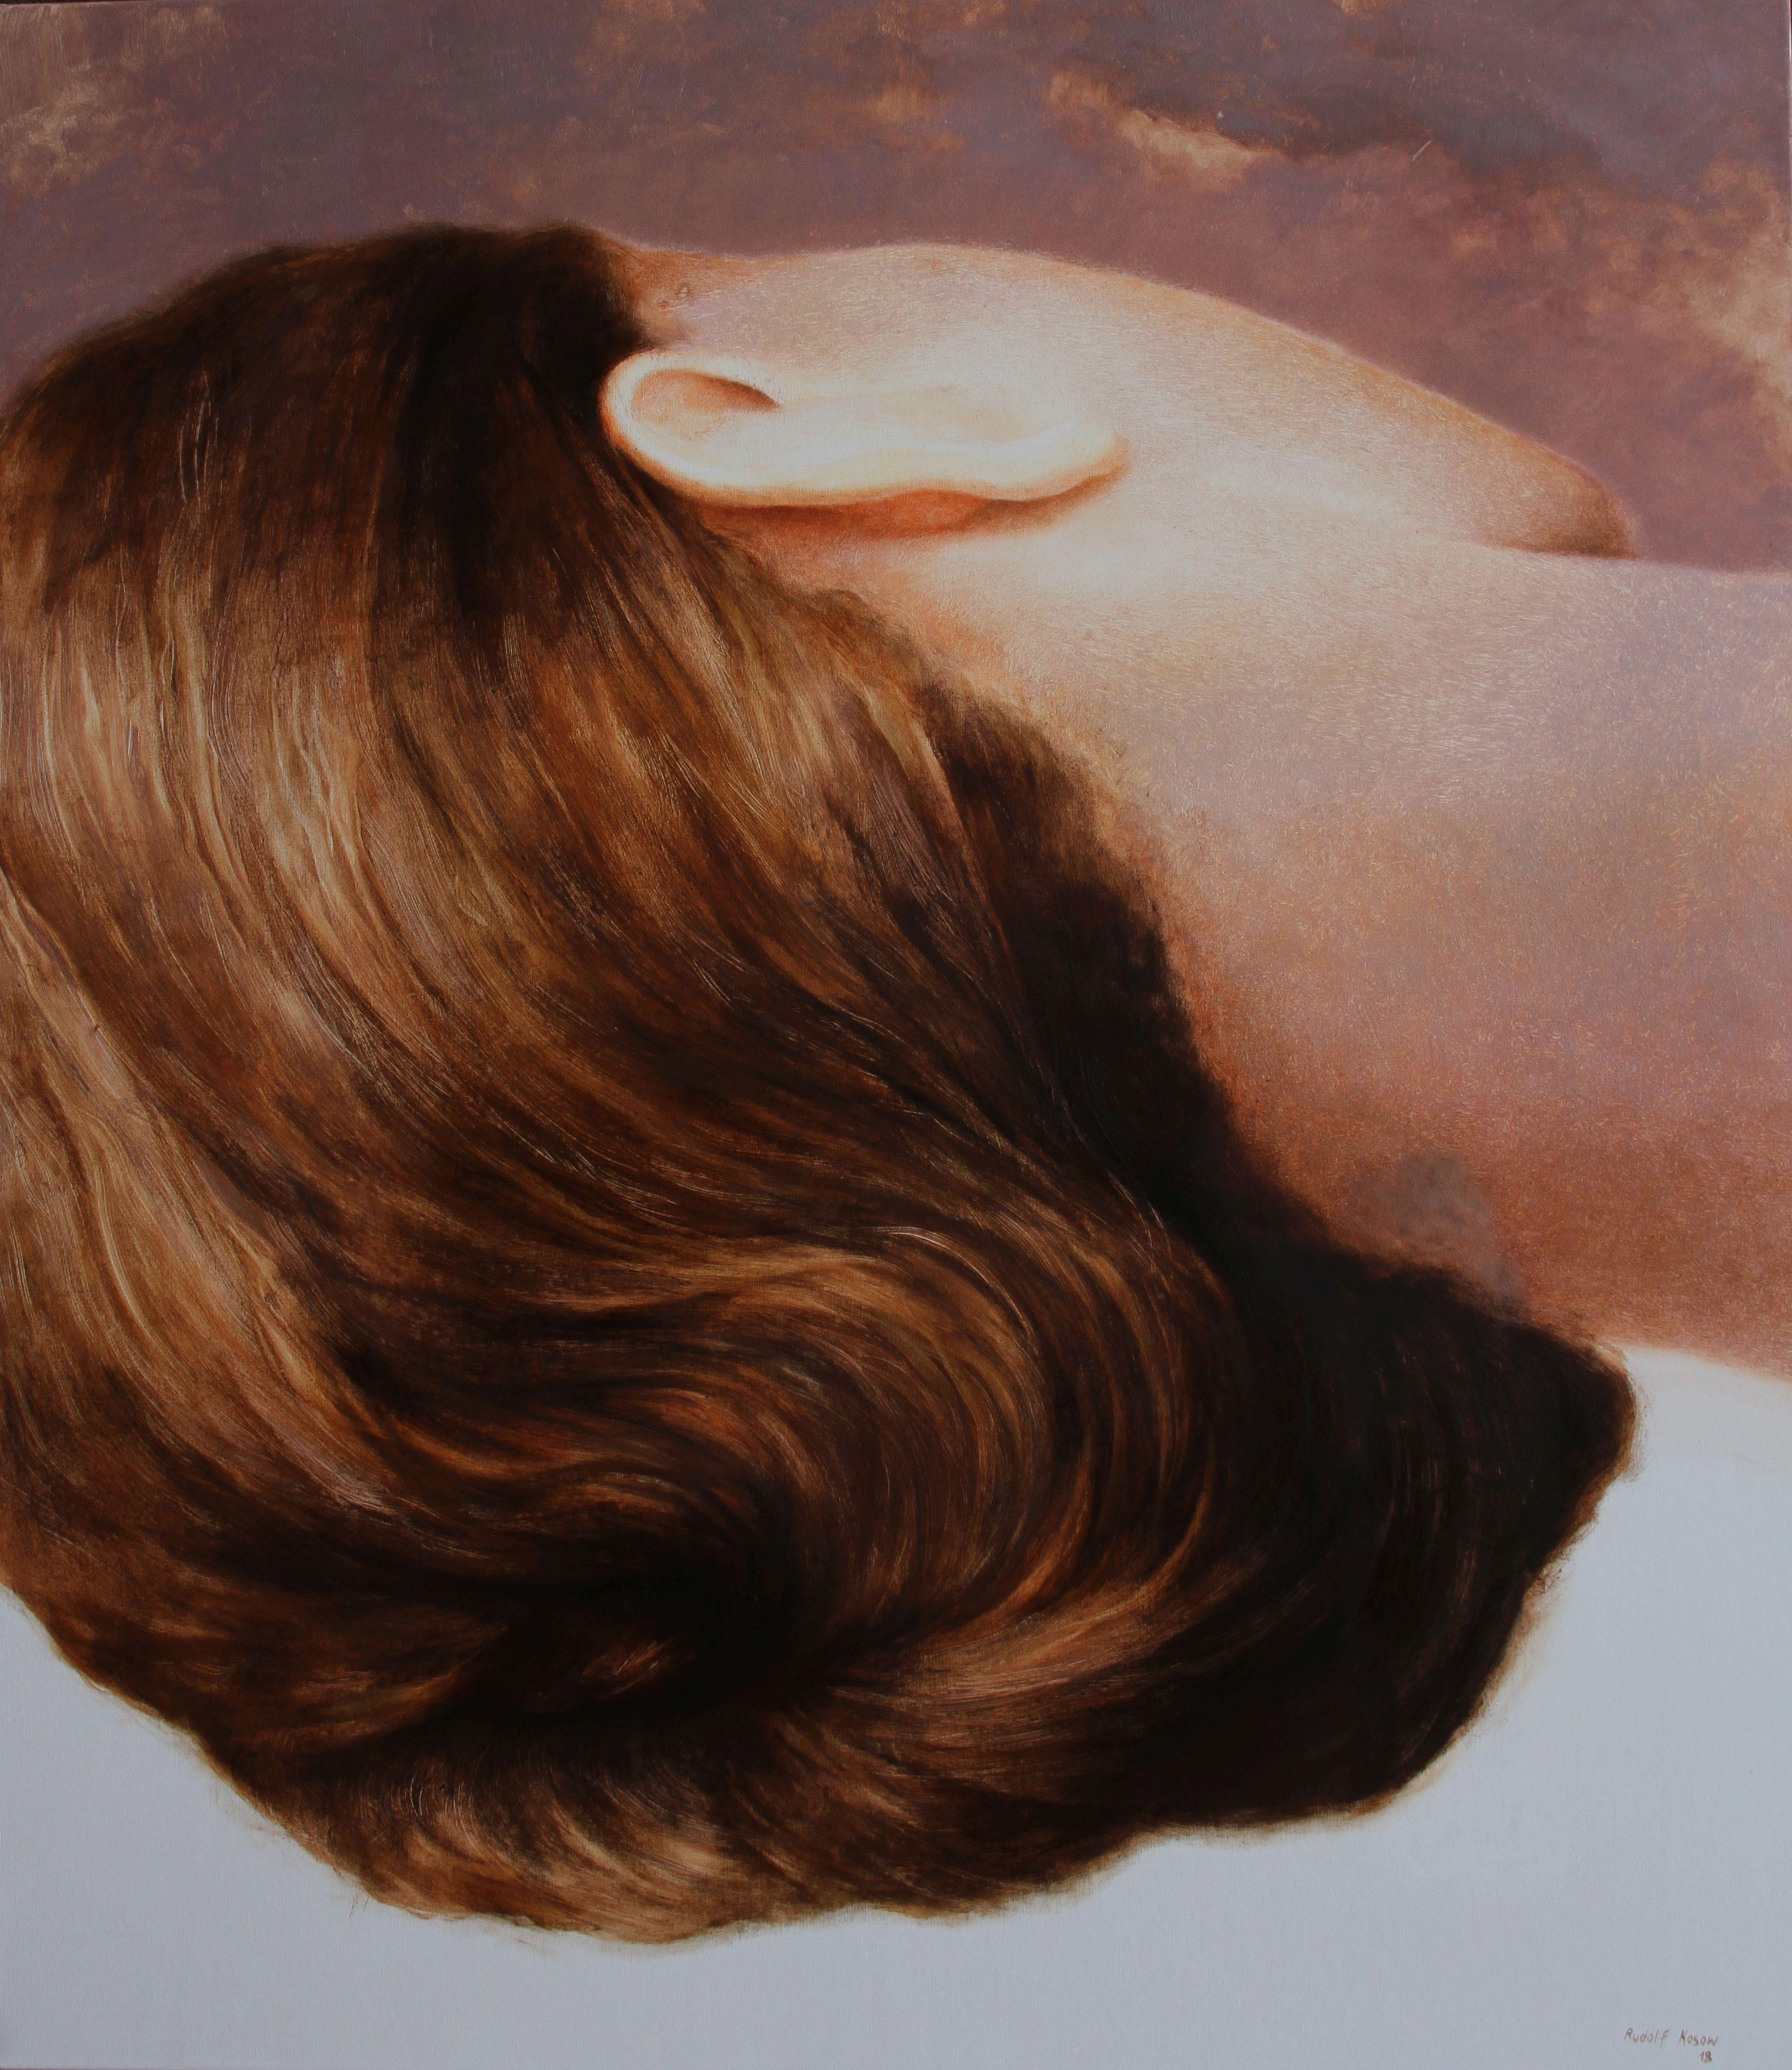 Repose (sleeping beauty woman hair portrait figurative oil painting flesh tones